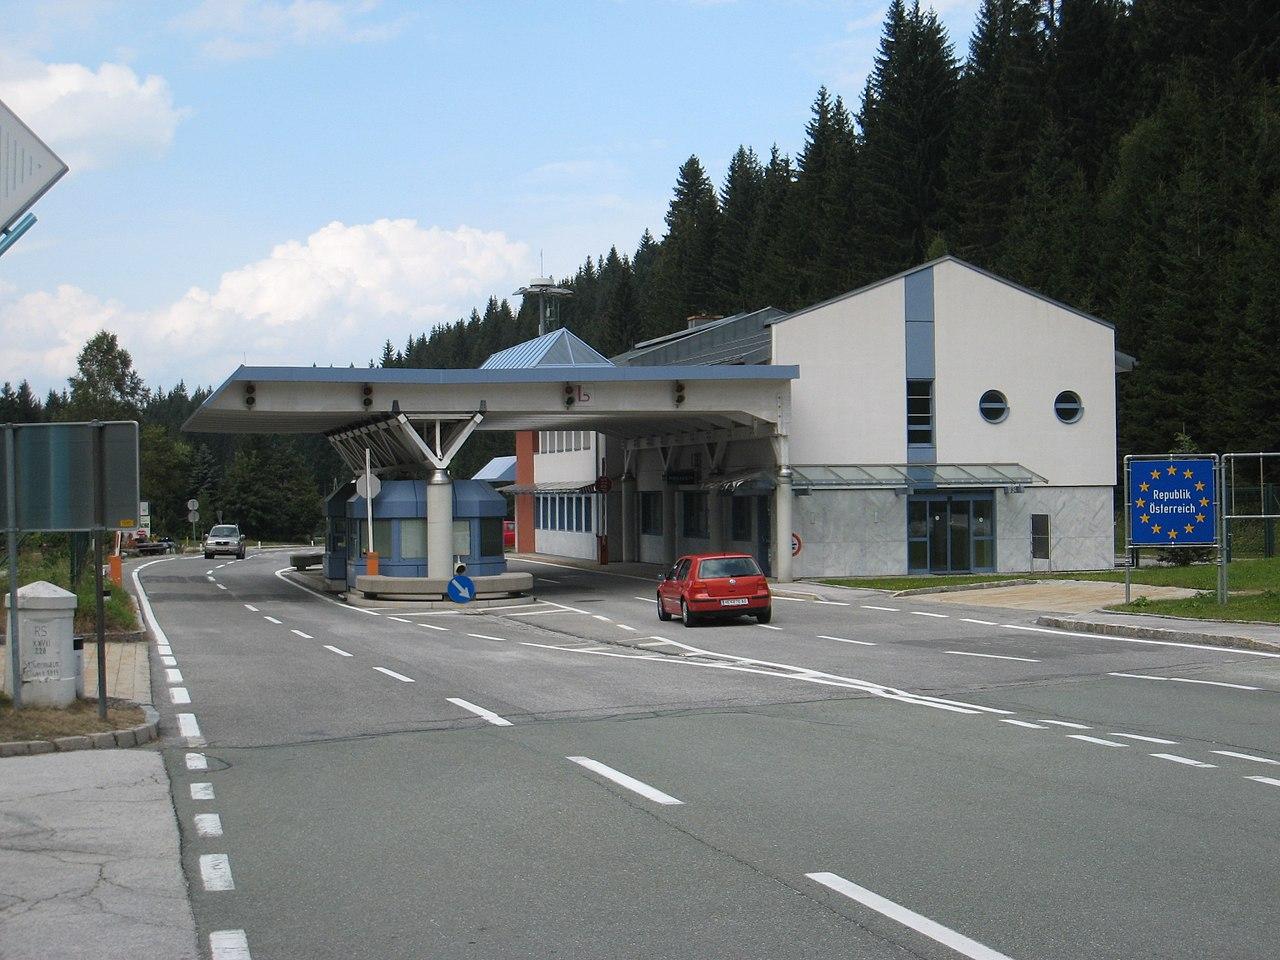 Grenzübergang am WurzenpassDavid Edgar • CC BY-SA 3.0